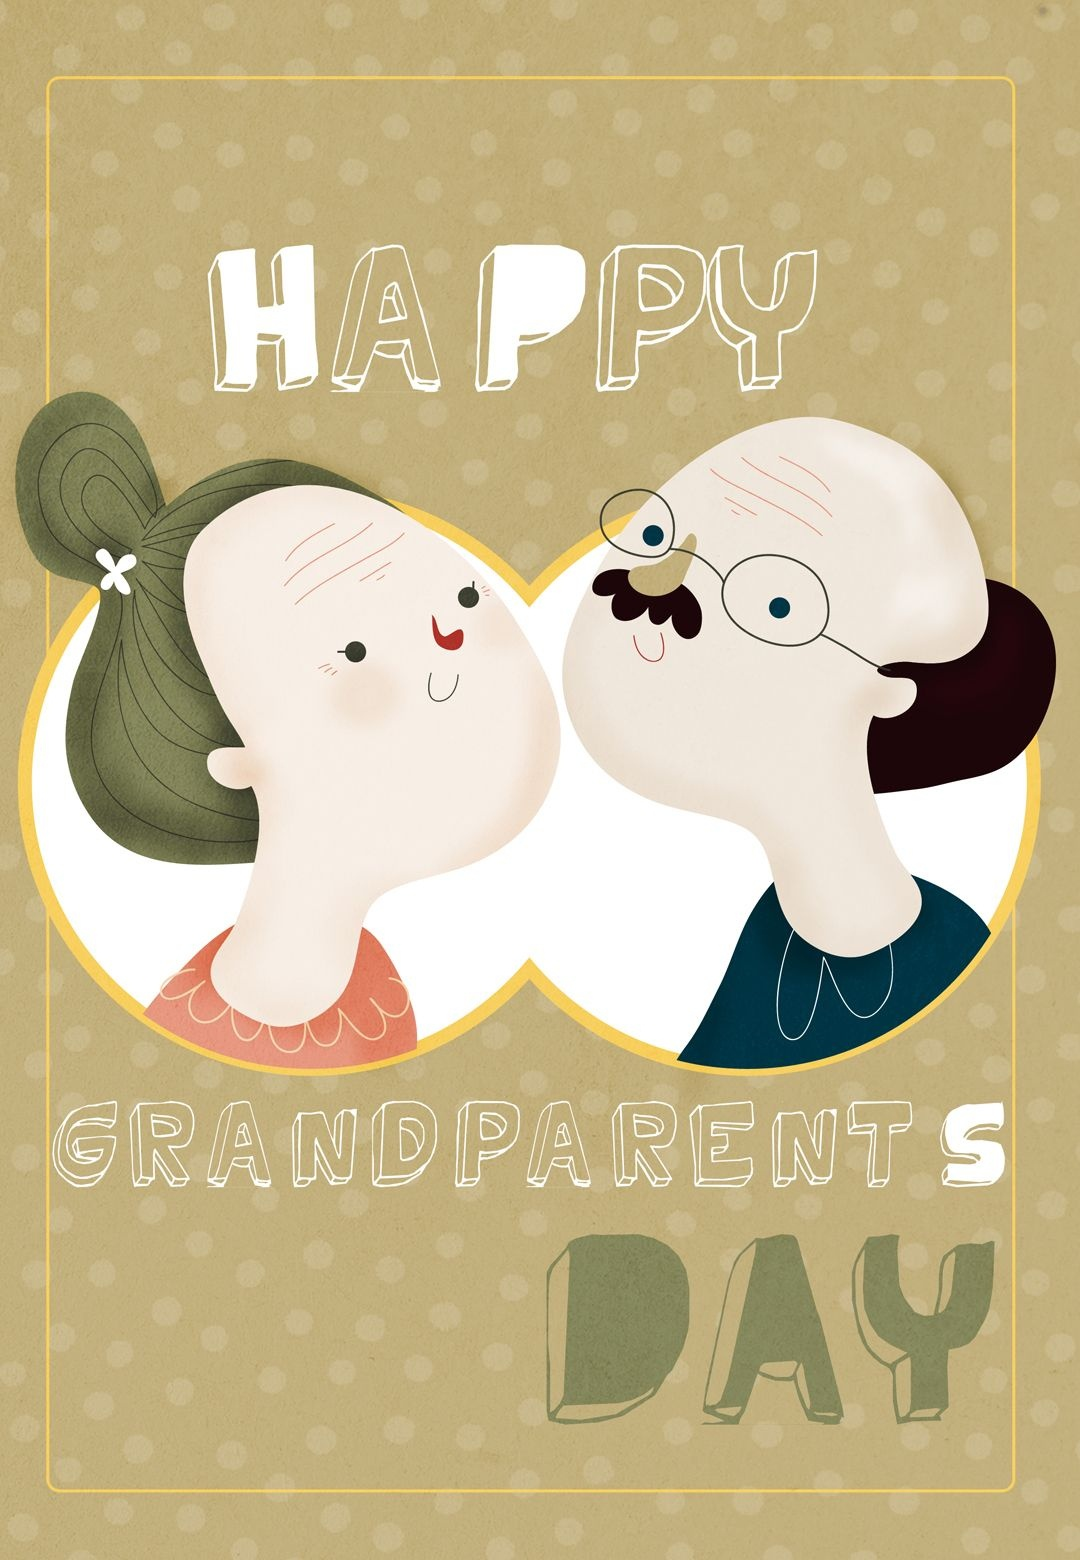 Free Printable Happy Grandparents Day Greeting Card | Grandparents - Grandparents Day Cards Printable Free